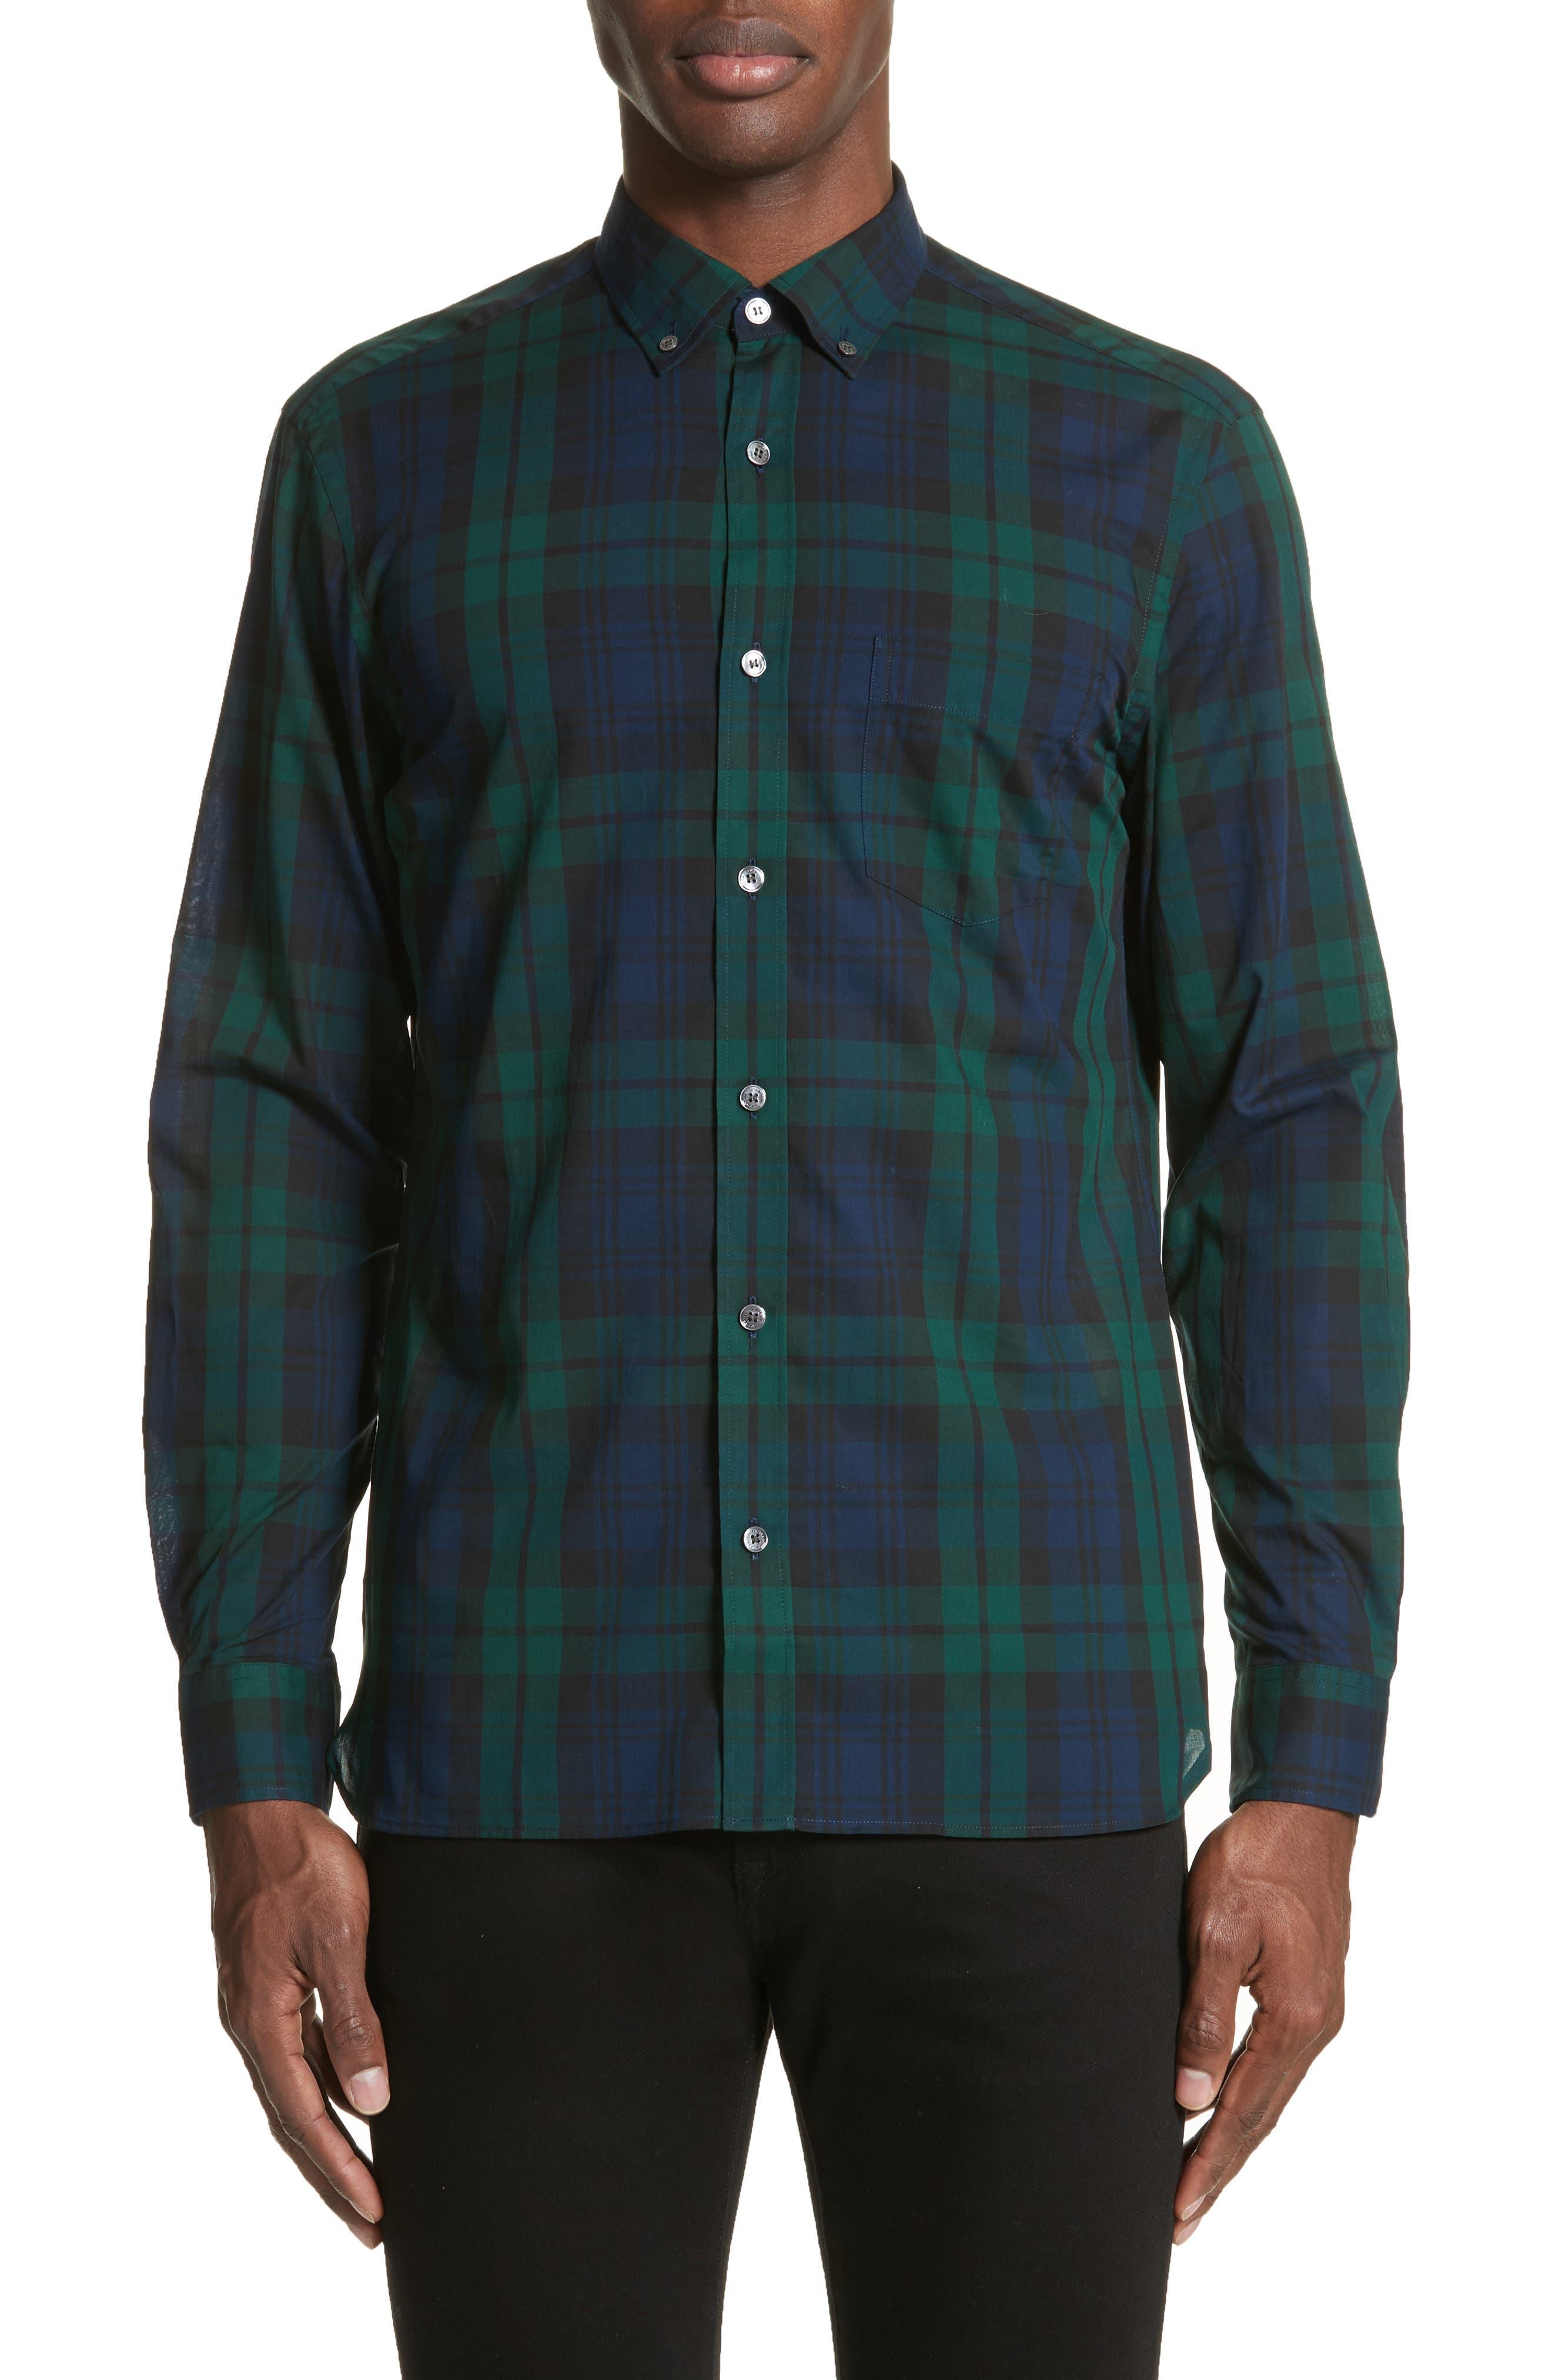 Salwick Tartan Plaid Sport Shirt,                             Main thumbnail 1, color,                             410